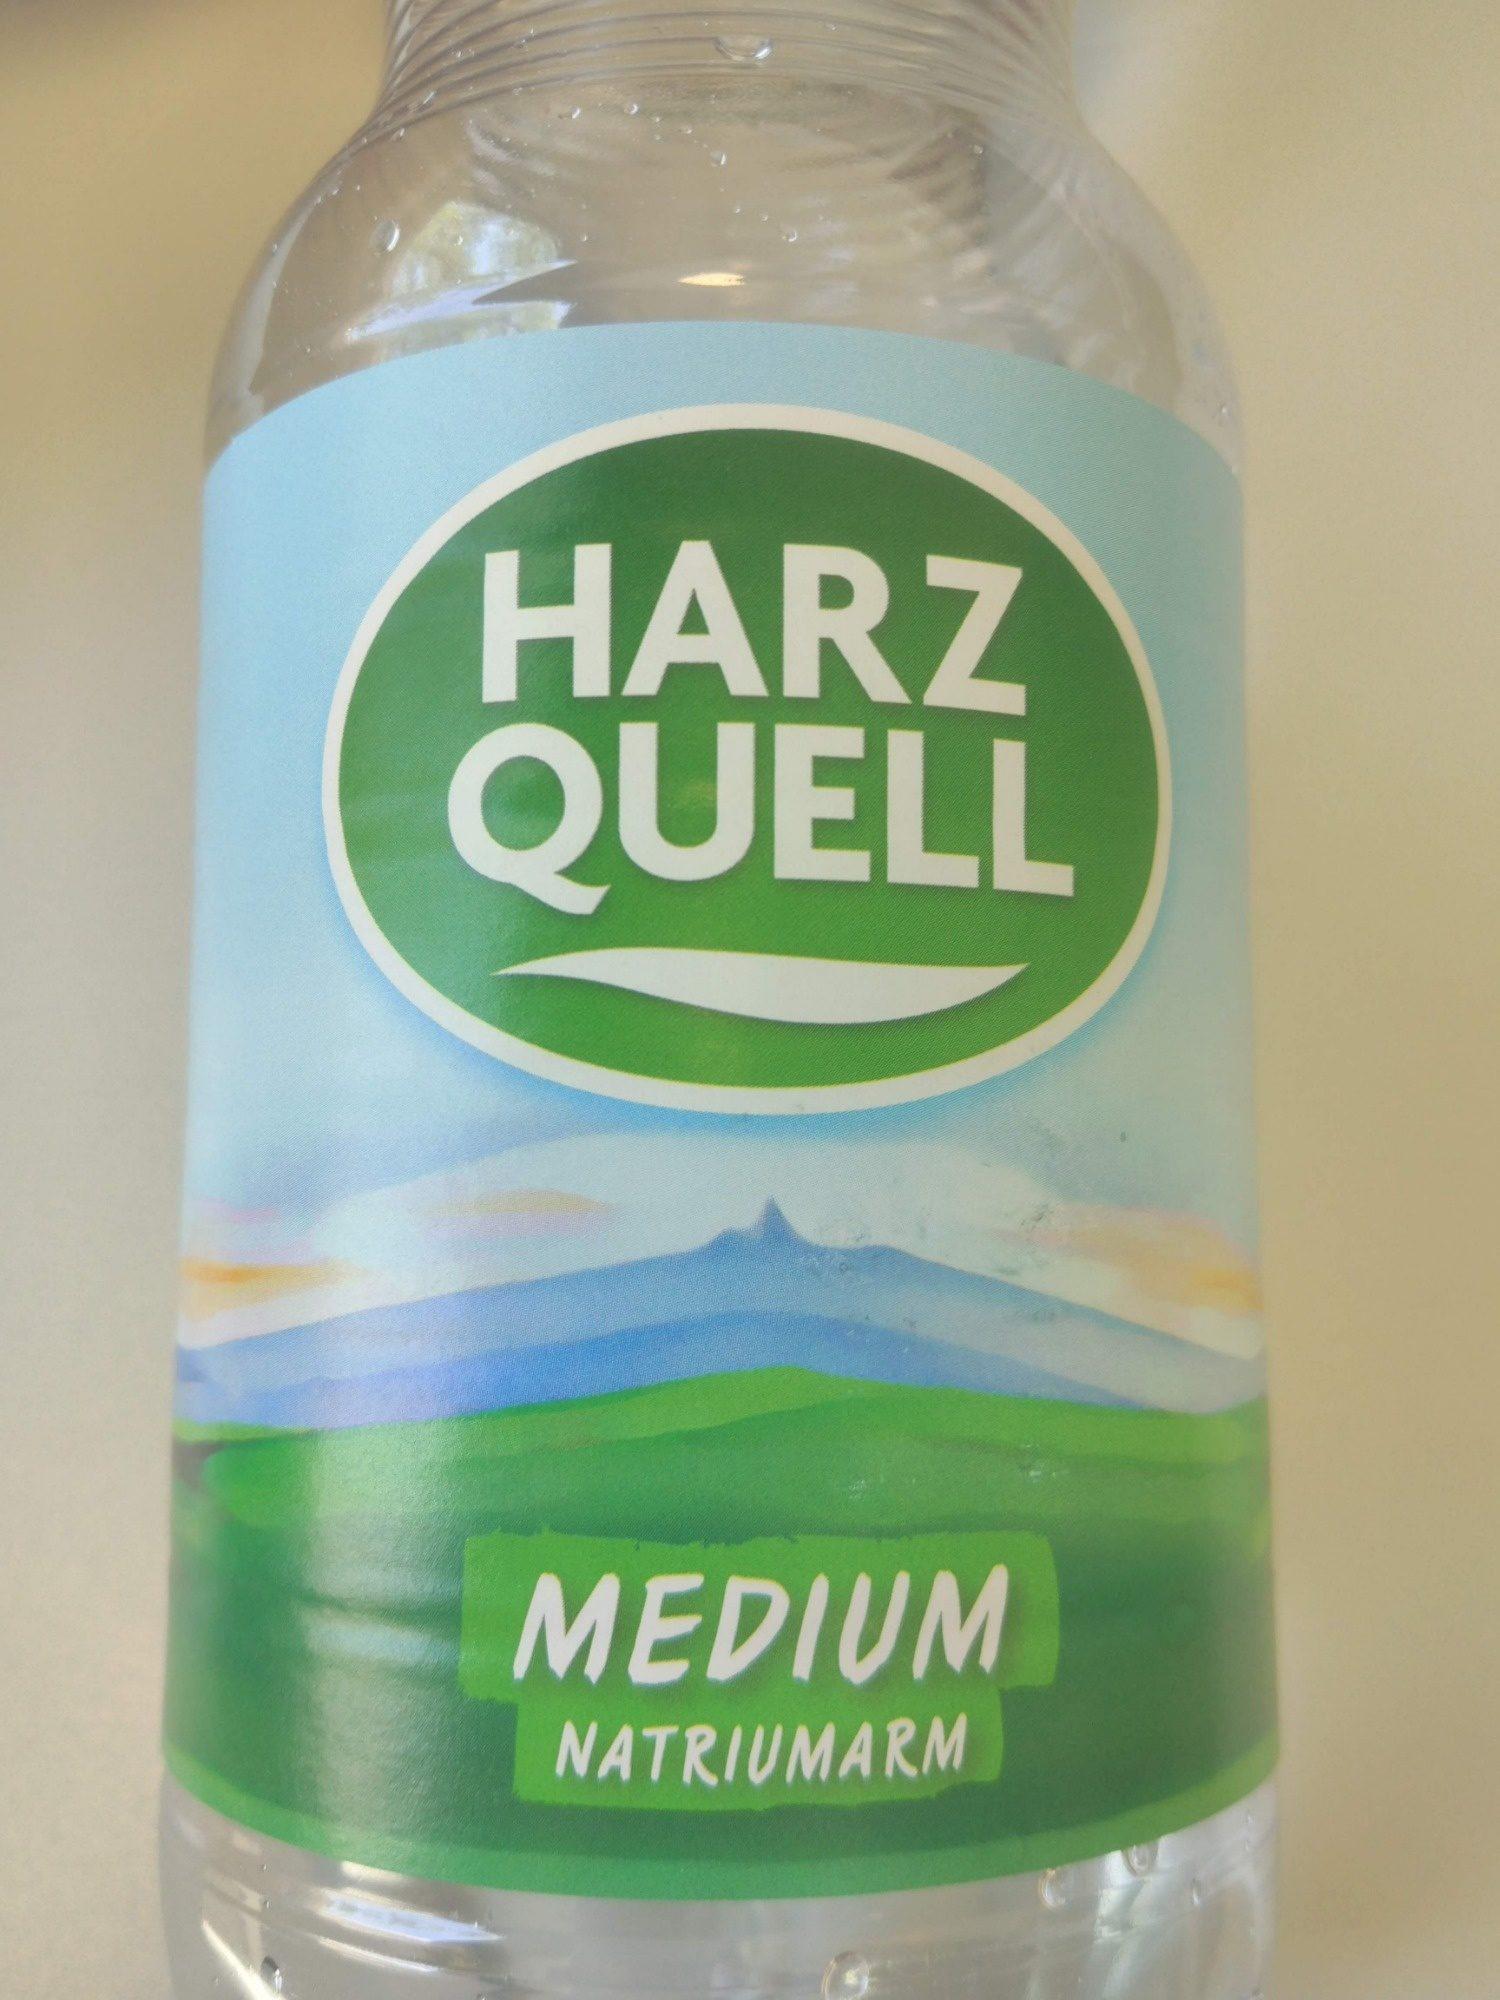 Harzquell Medium natriumarm - Product - de